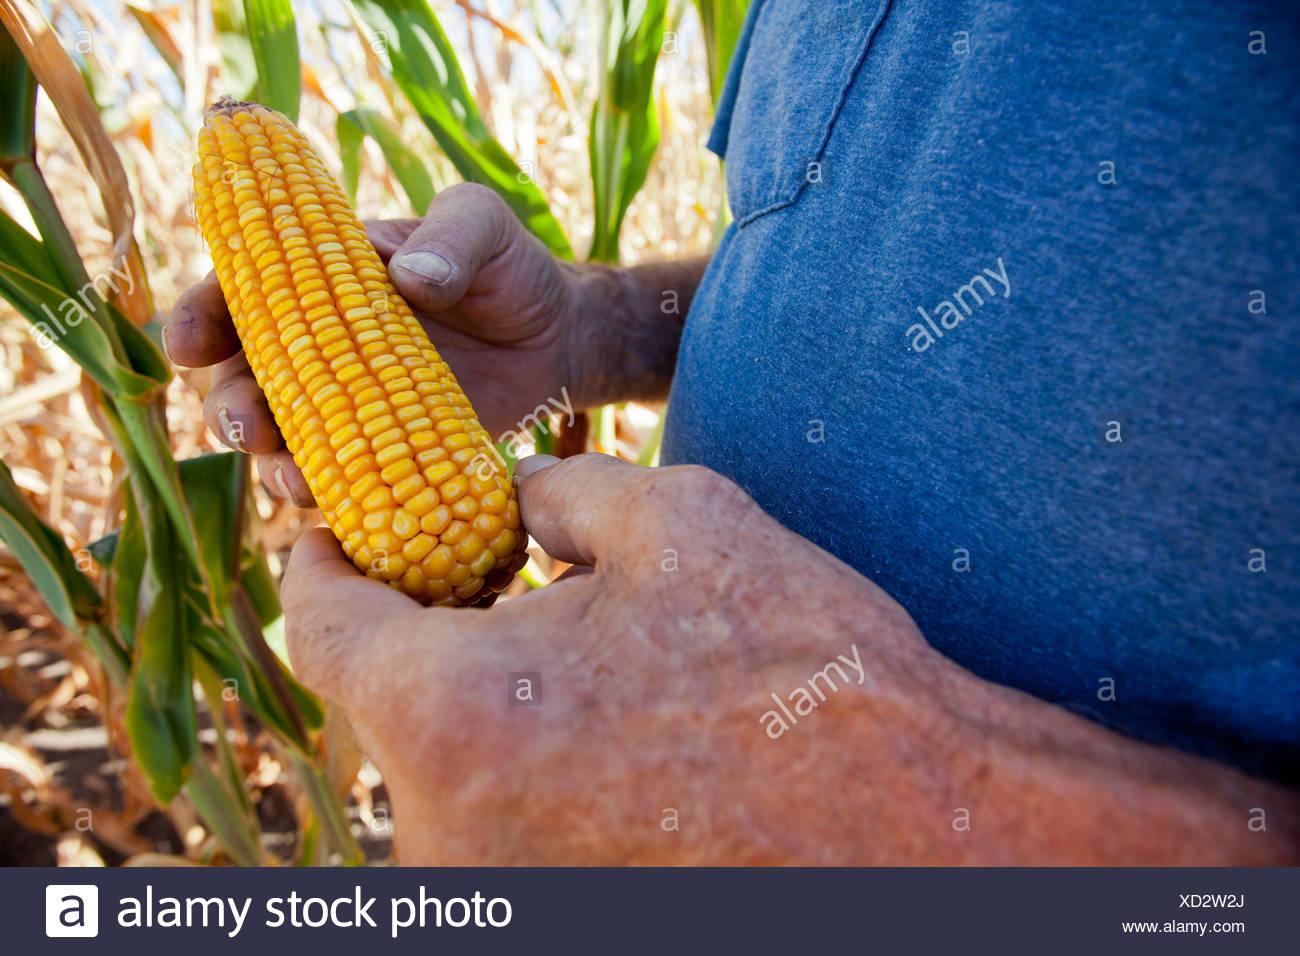 Farmer examining ear of corn - Stock Image